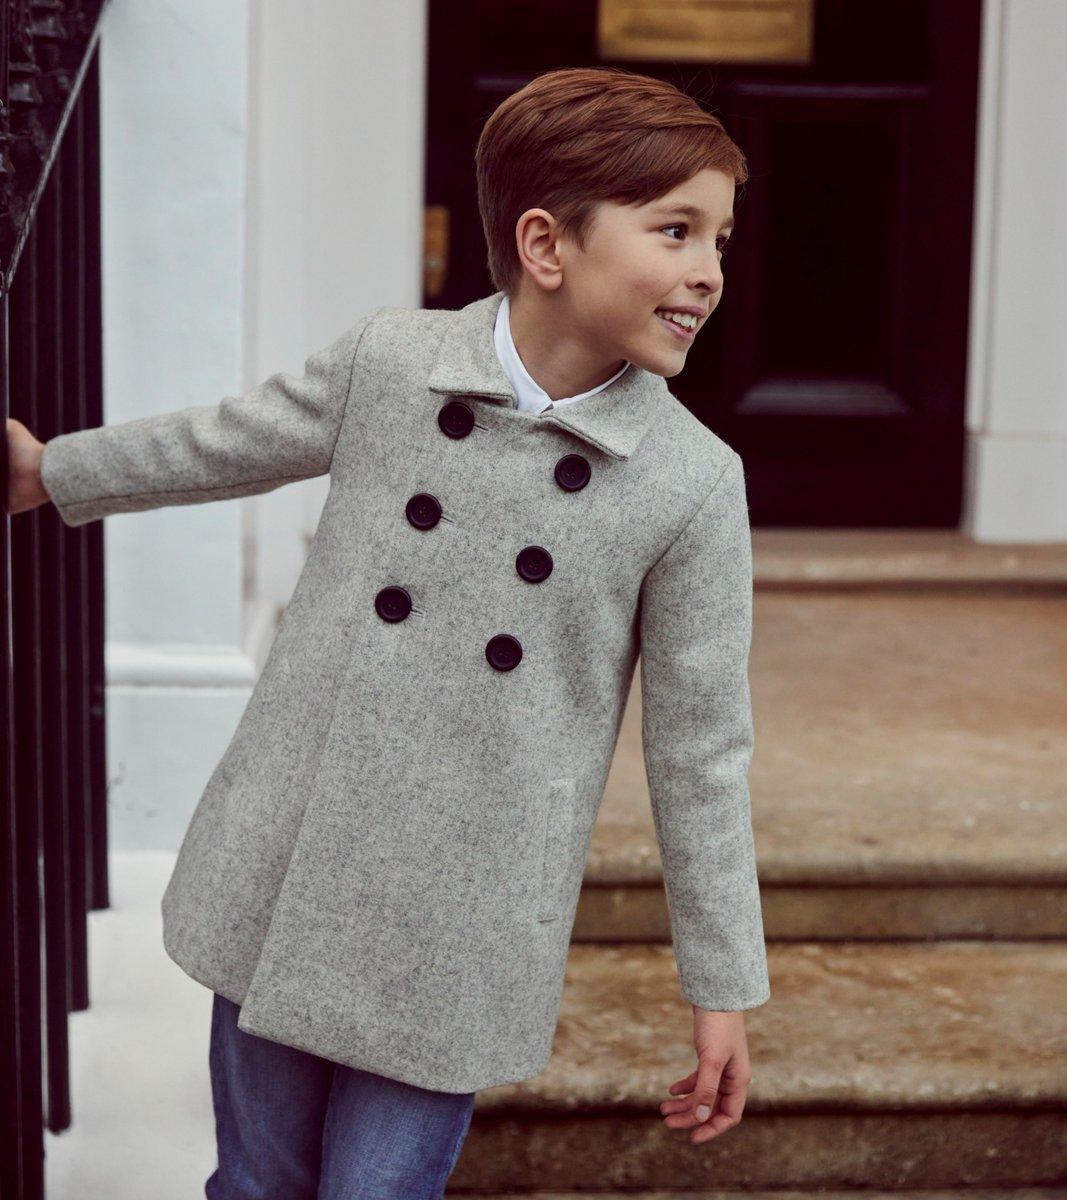 Pimlico Pea Coat from @BritannicalUK  https://t.co/3kSgyr2nBX Ref Number: 1367512 #outerwear #boyscoat #peacoat #woolcoat #greycoat #tailoredcoat #boysclothing #childrensclothing #kidswear #childrenswear #madeinbritain #sustainable #aw21 #britannical #britannicallondon https://t.co/AdGJfa8xZ5